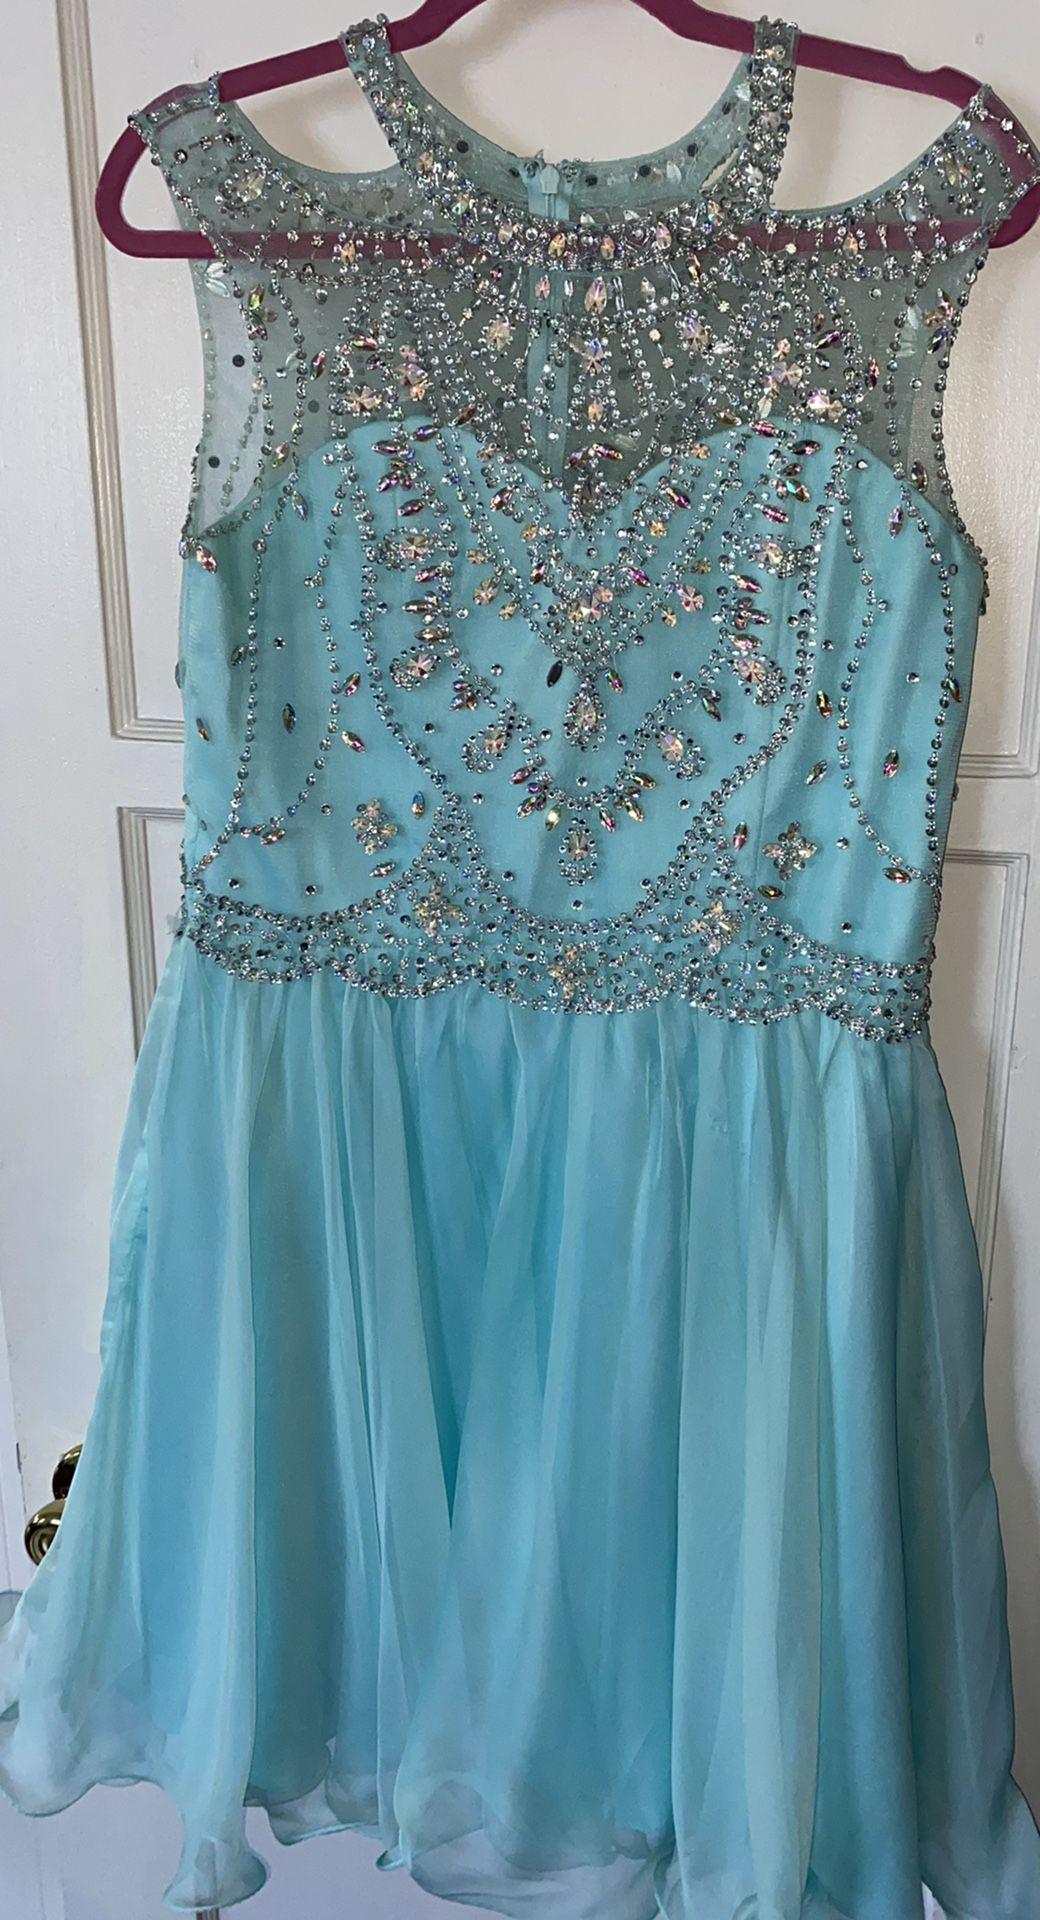 Calla Collection Girls Dress